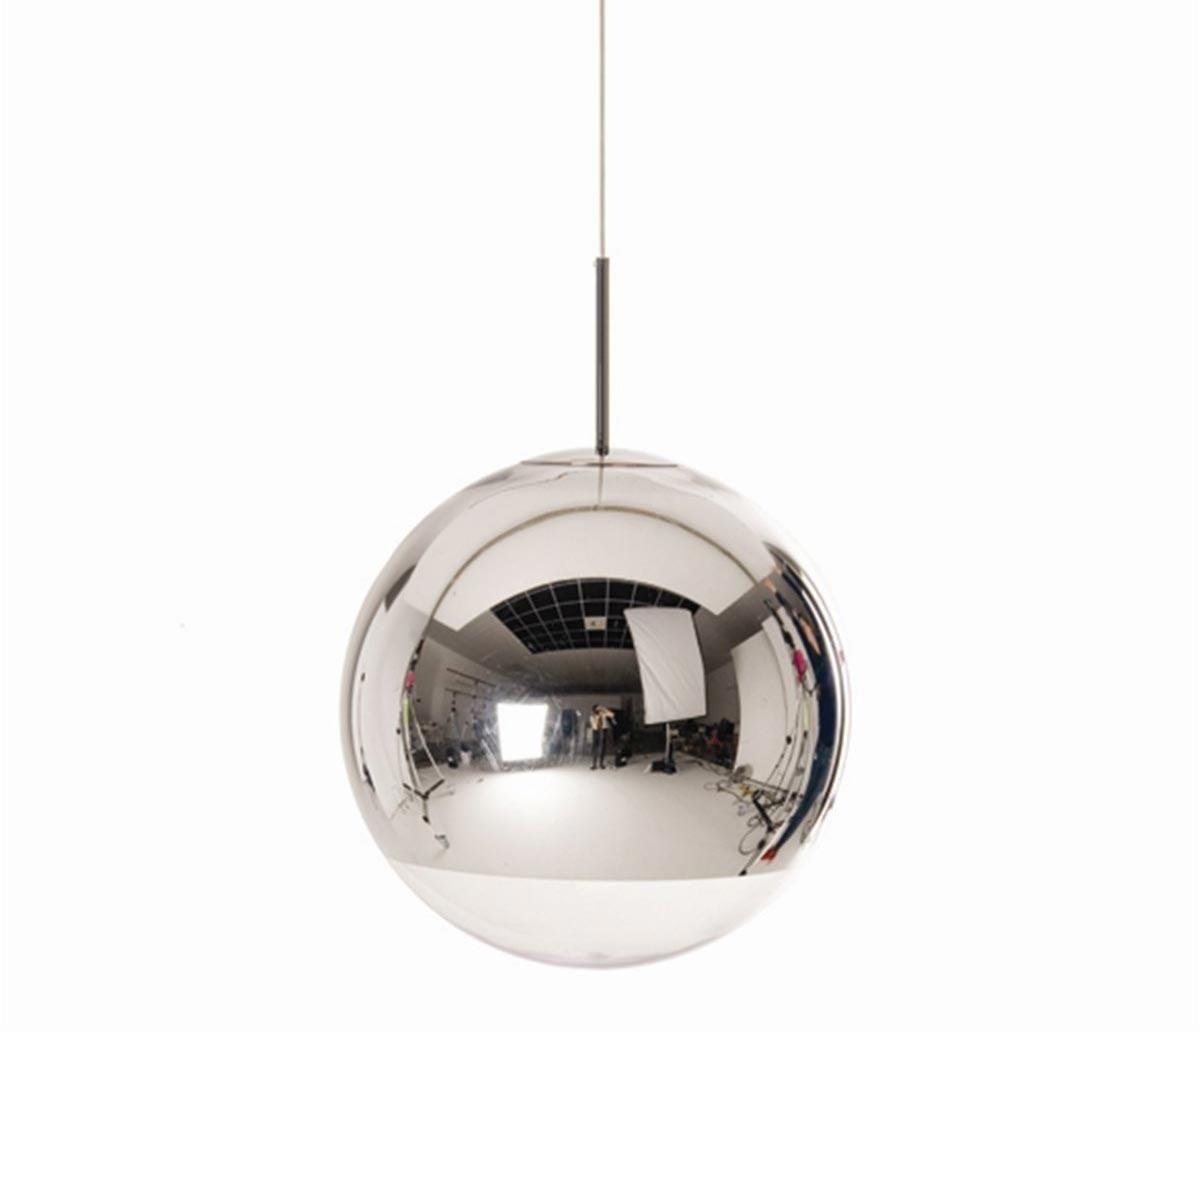 mirror ball pendant suspension lamp chrome tom dixon. Black Bedroom Furniture Sets. Home Design Ideas